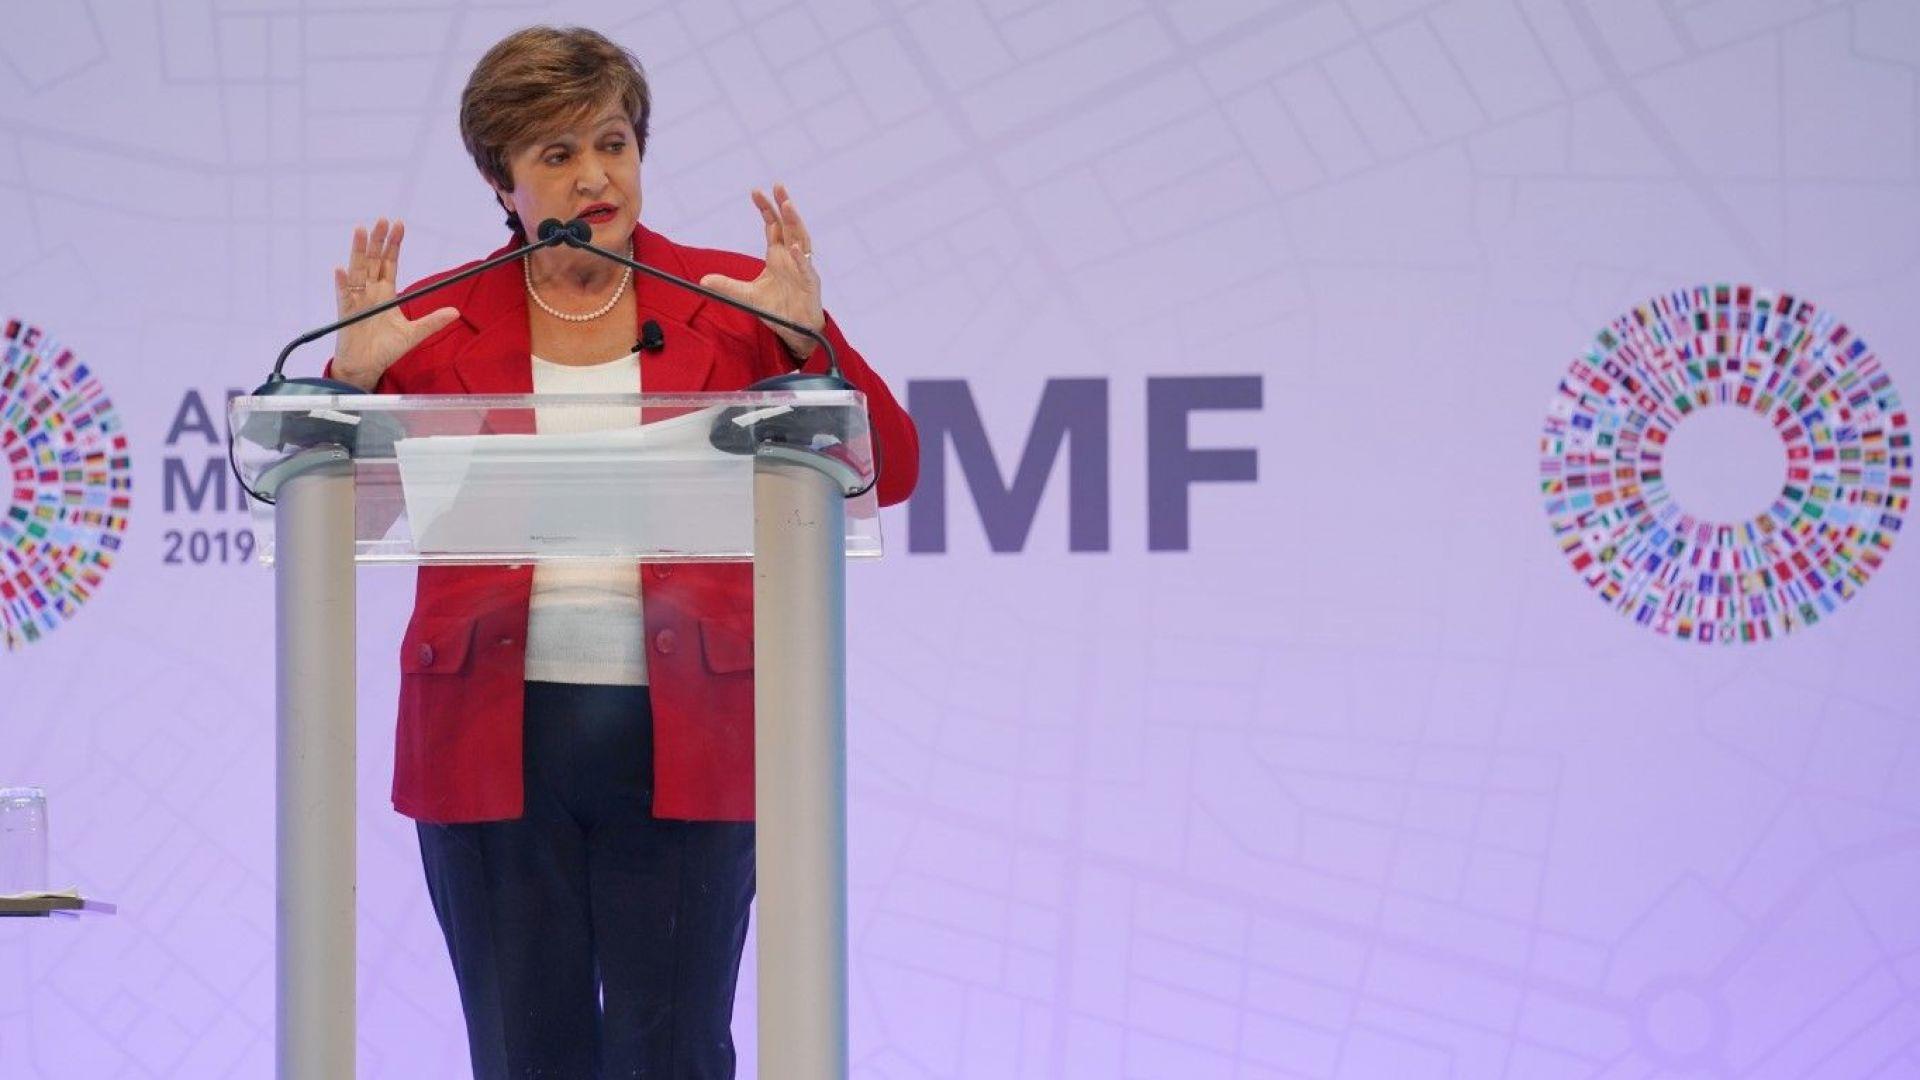 Кристалина Георгиева: Световната икономика е натрупала рекорден дълг,  което е опасно